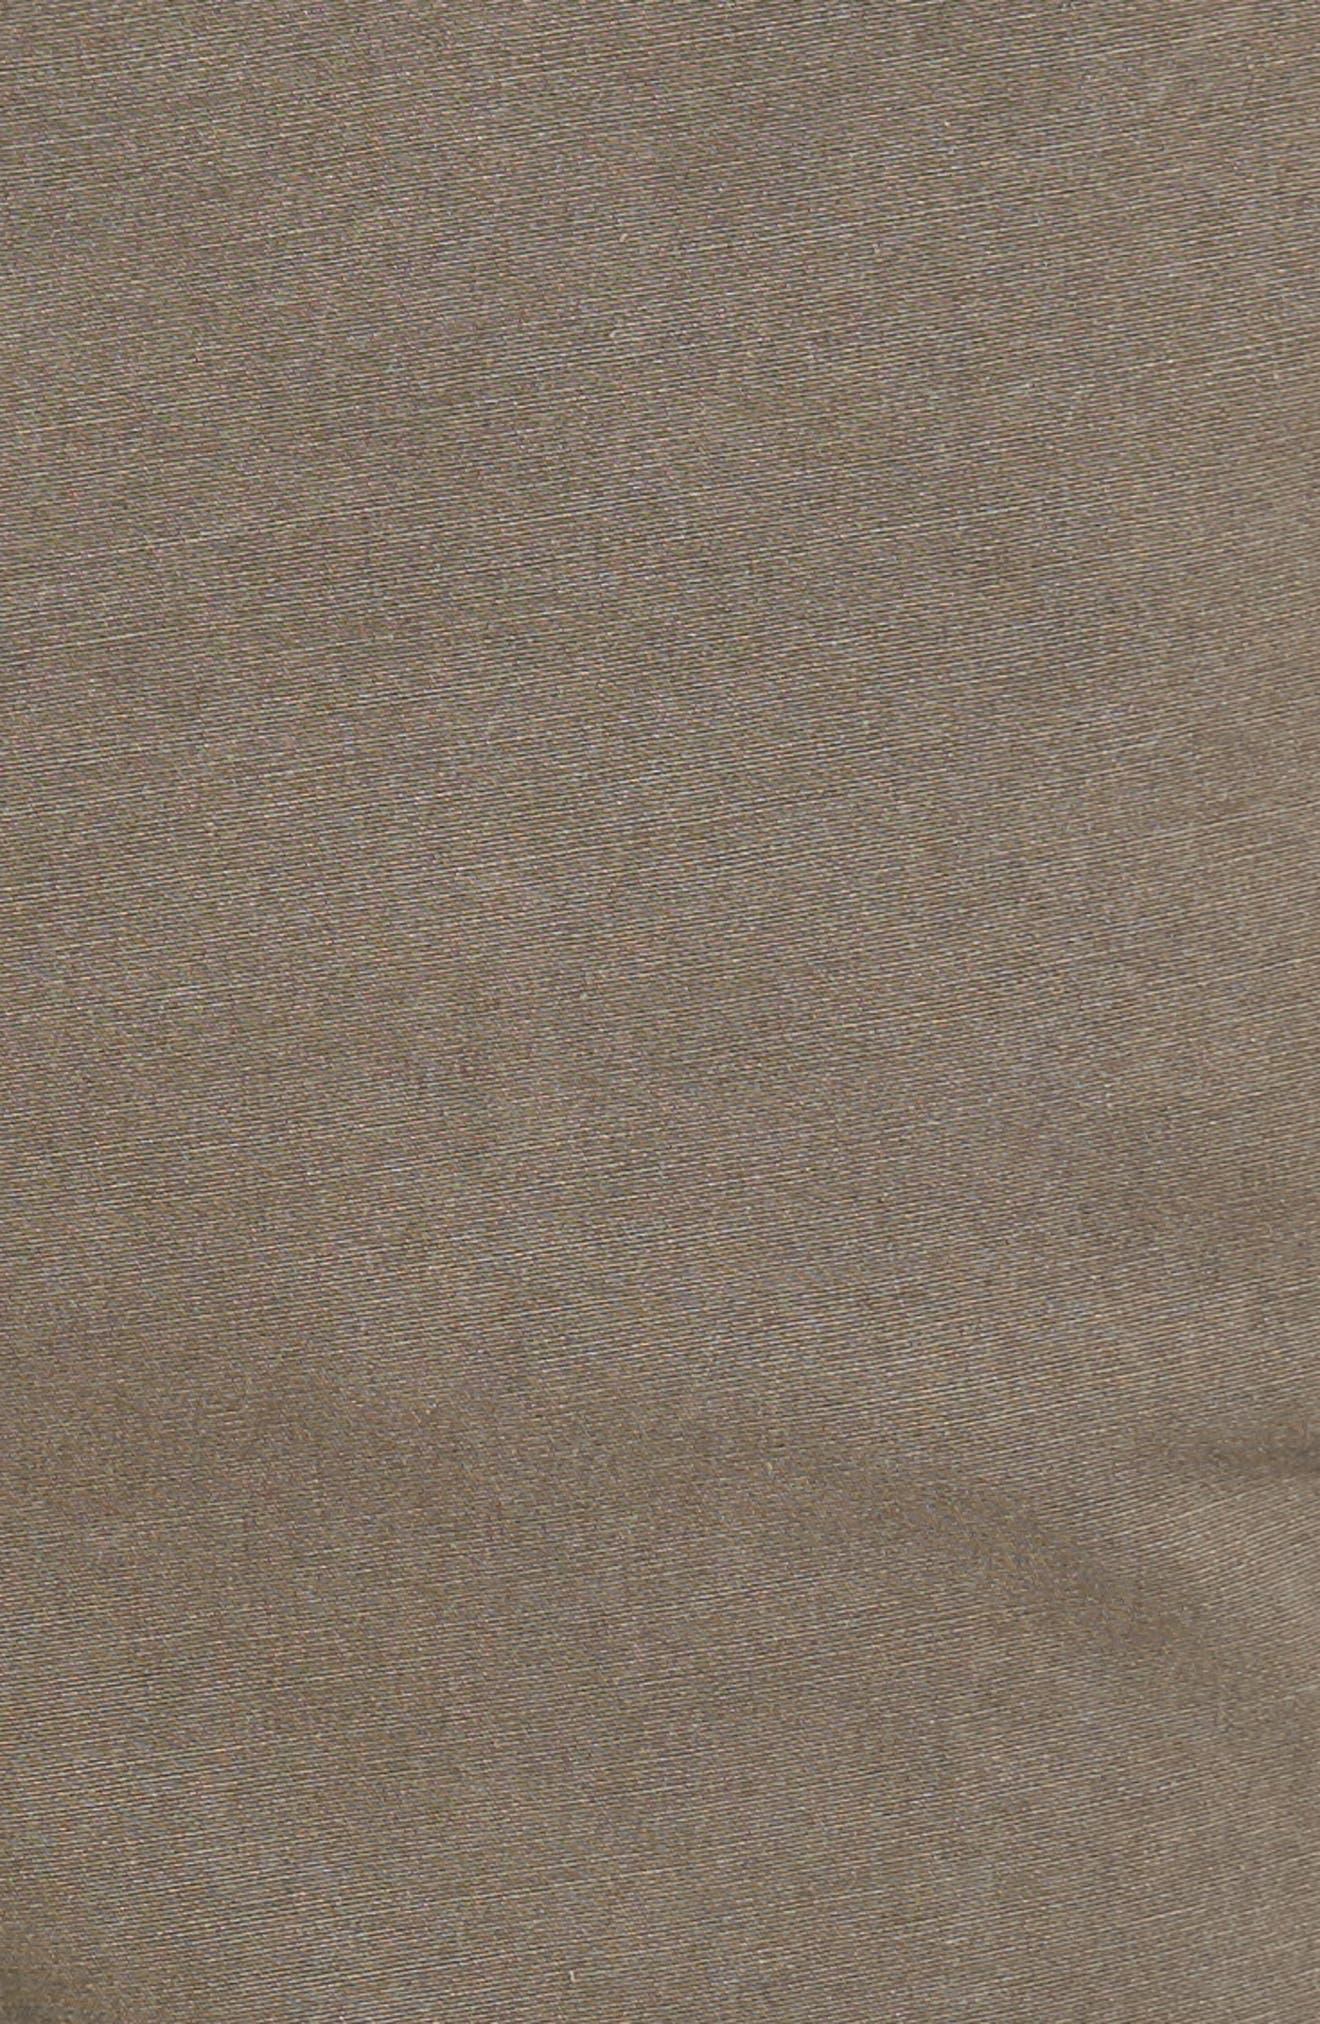 Slim Stretch Poplin Drawcord Pants,                             Alternate thumbnail 5, color,                             Greystone Pigment